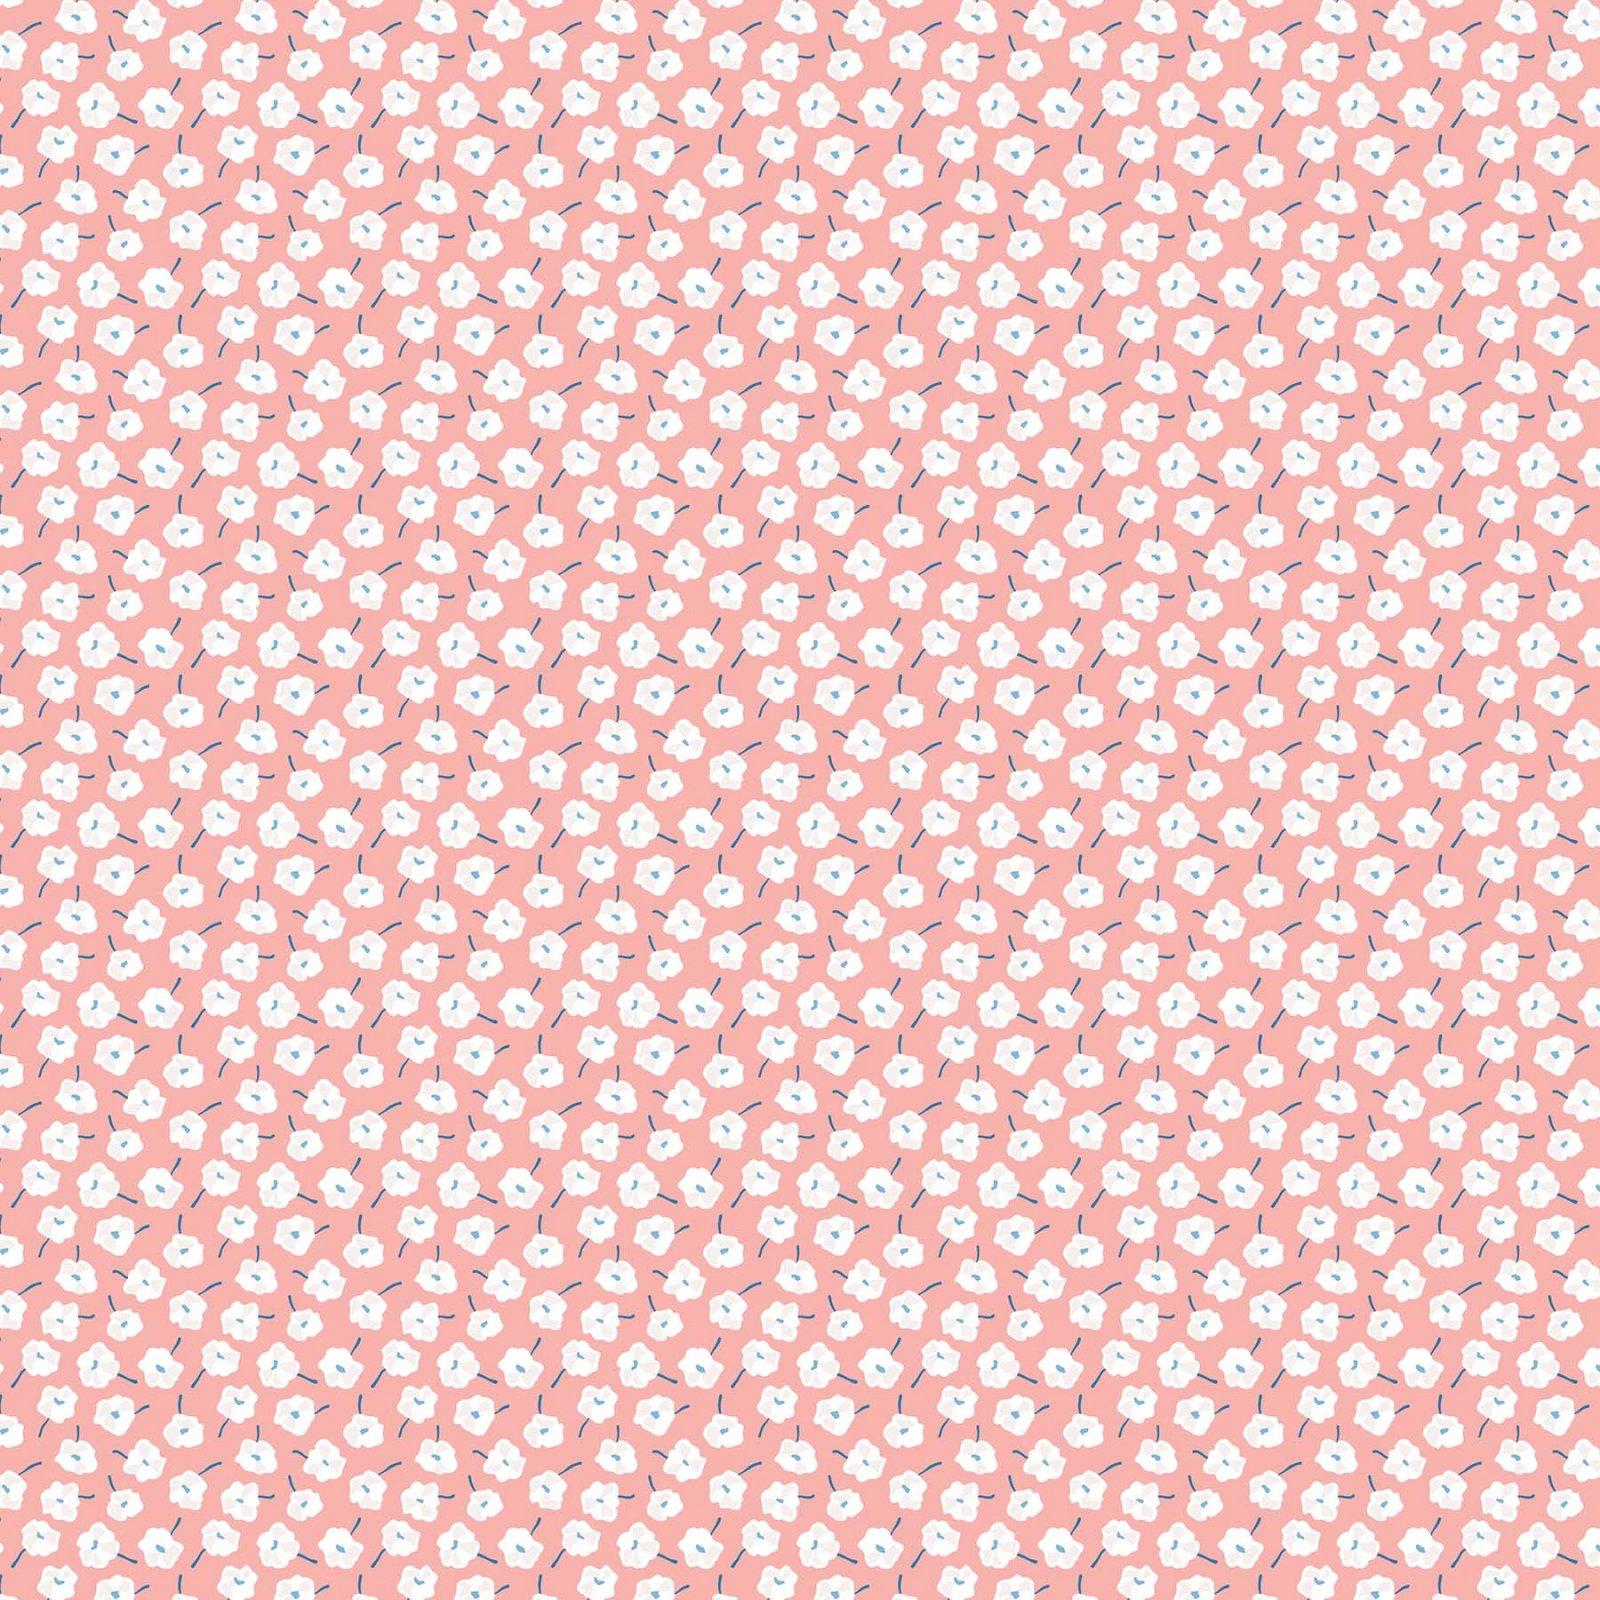 Rollakan Rayon Small Floral Blush Pink